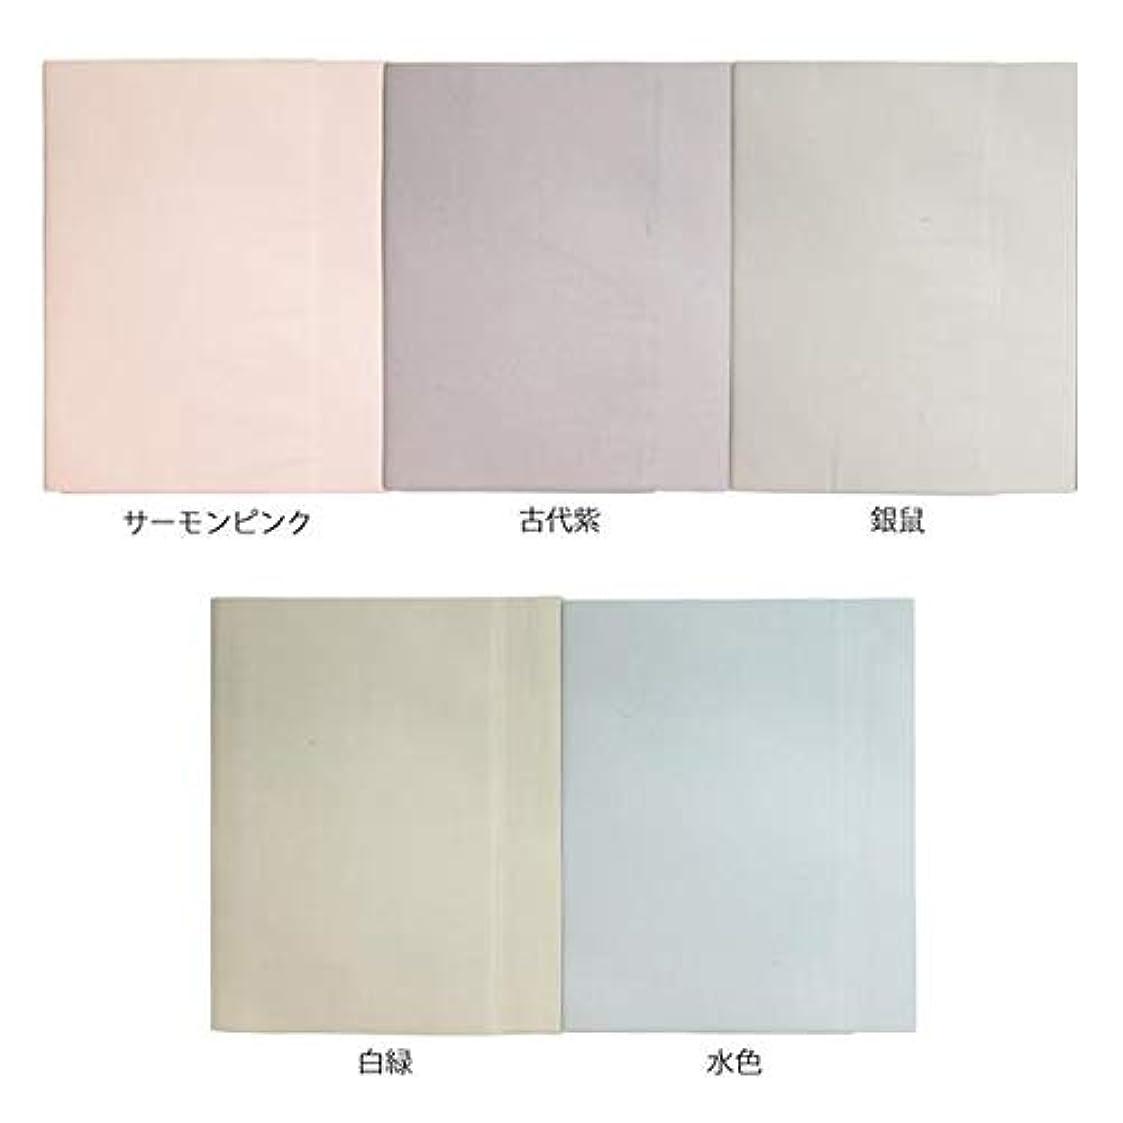 支払い冗談で失漢字用加工紙 豊水 2×6尺 10枚?503AA